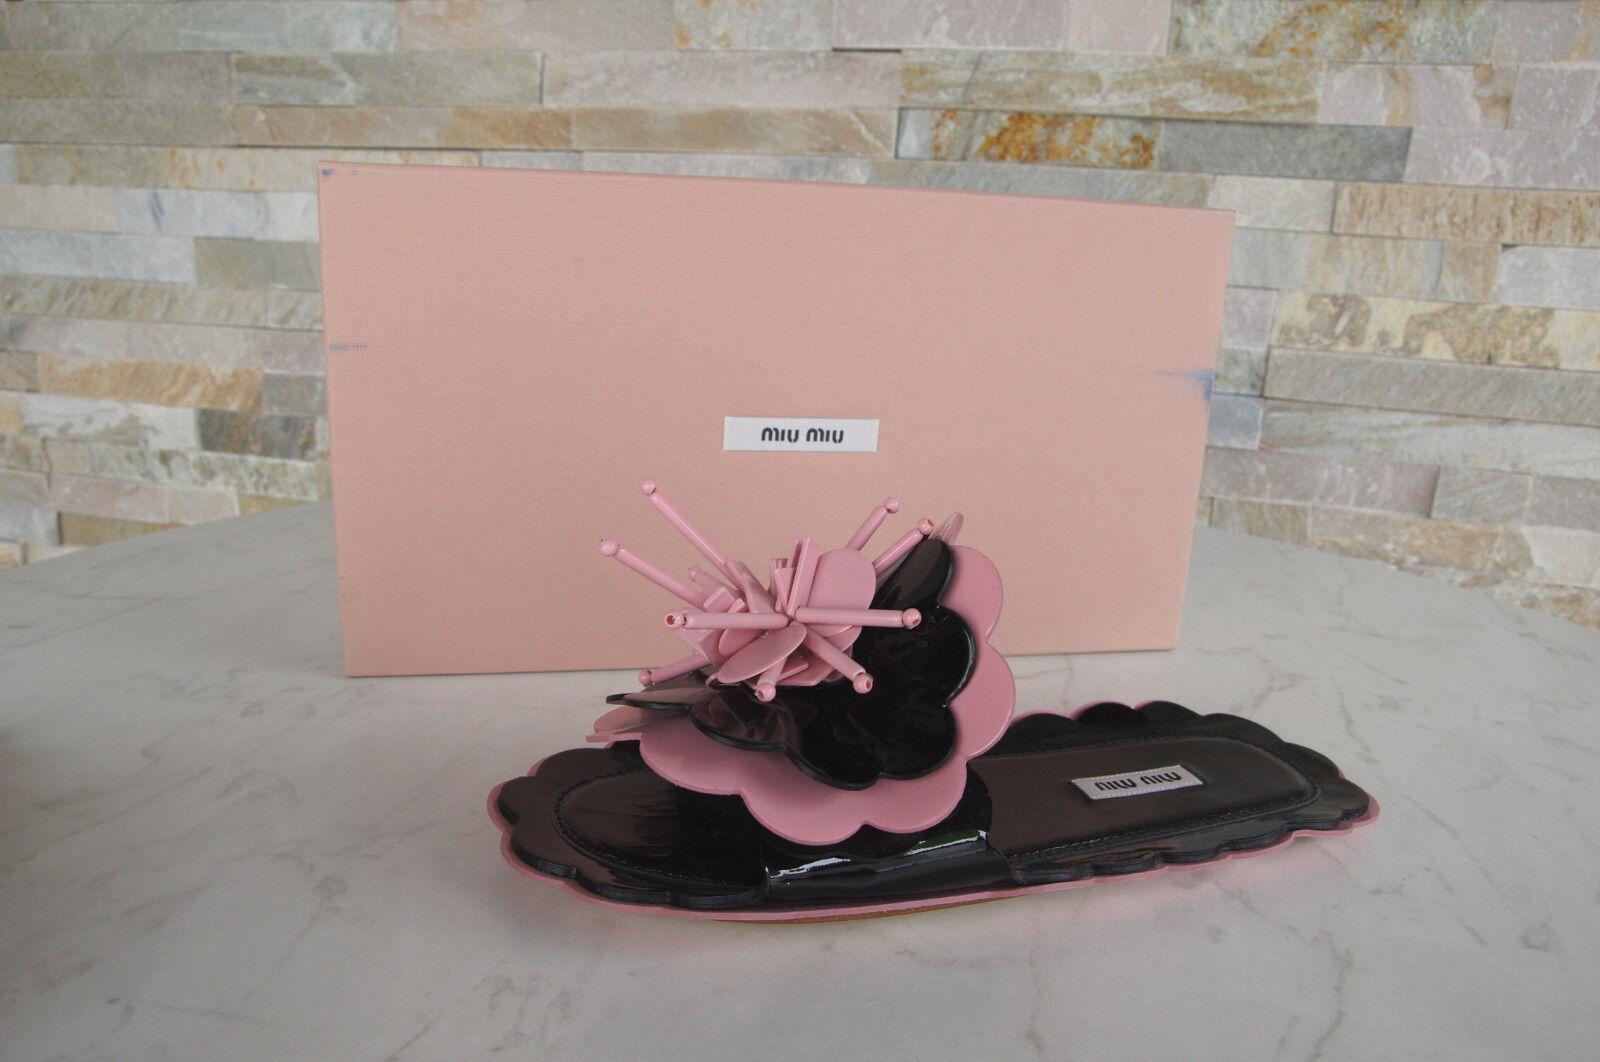 MIU Miu taglia 38,5 Sandali Sandali Ciabatte Scarpe Nere Rosa Nuovo UVP